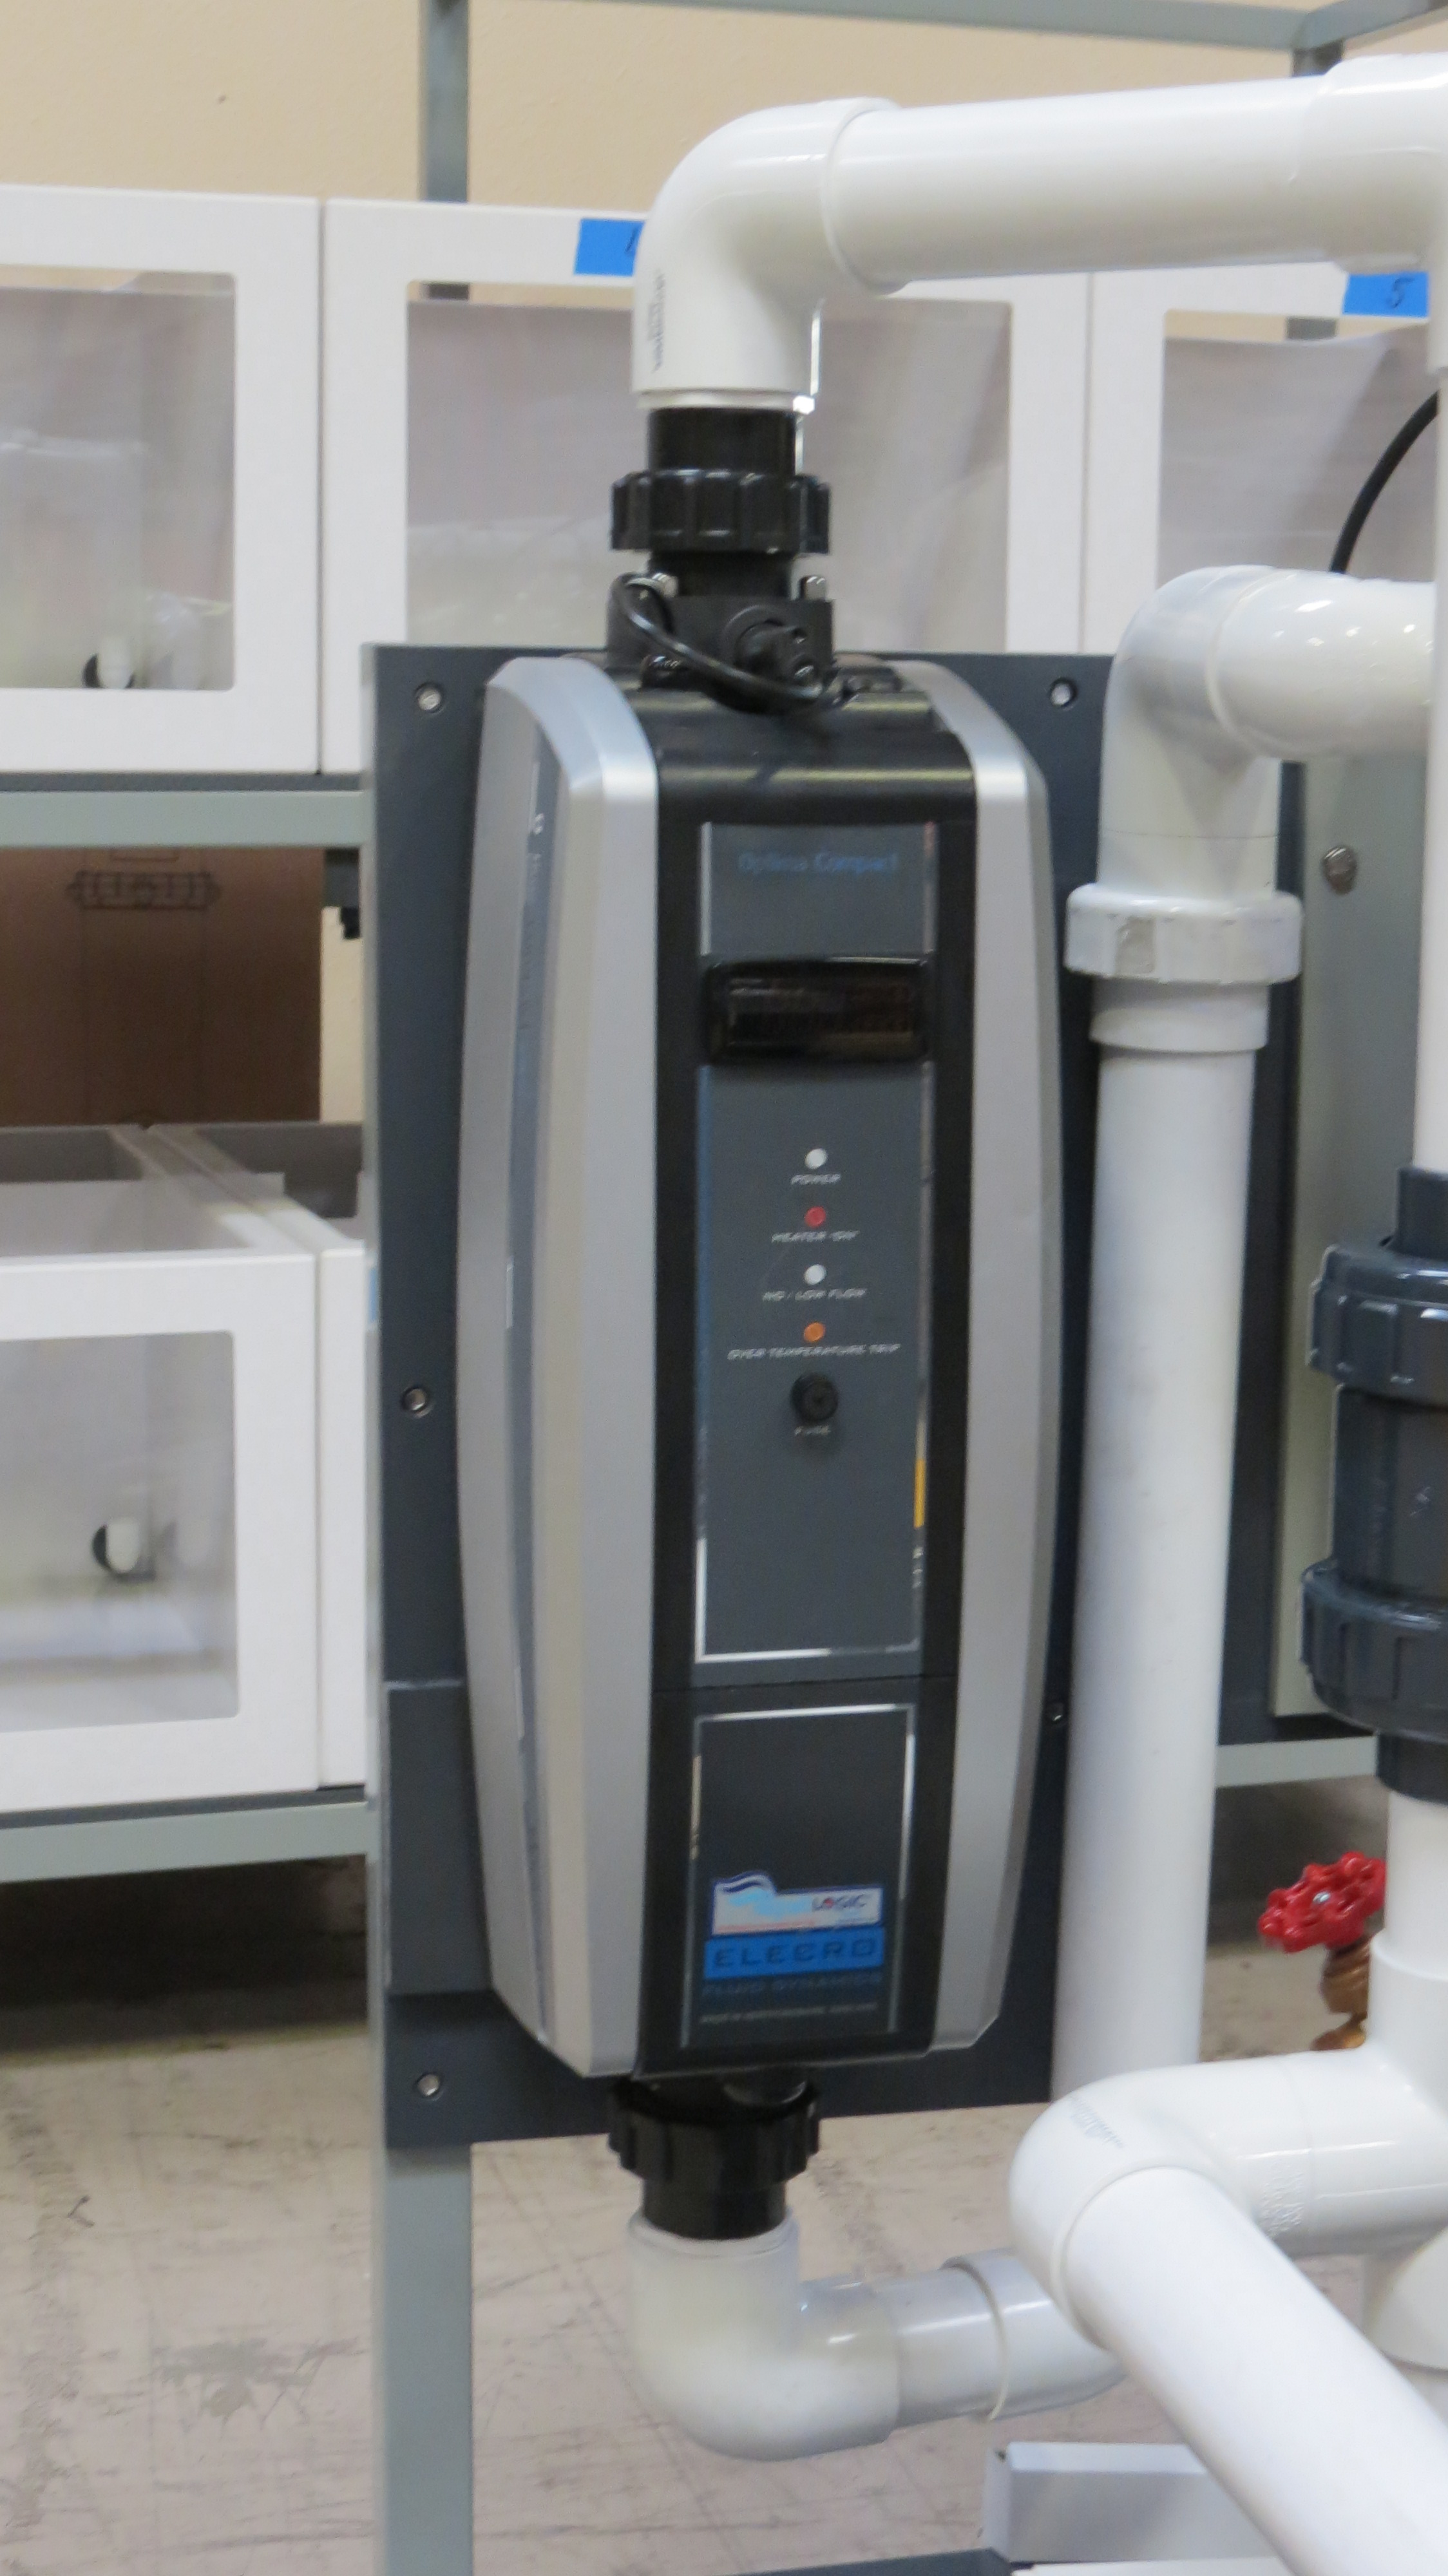 Optima Compact Plus 6kw 18kw Aqualogic